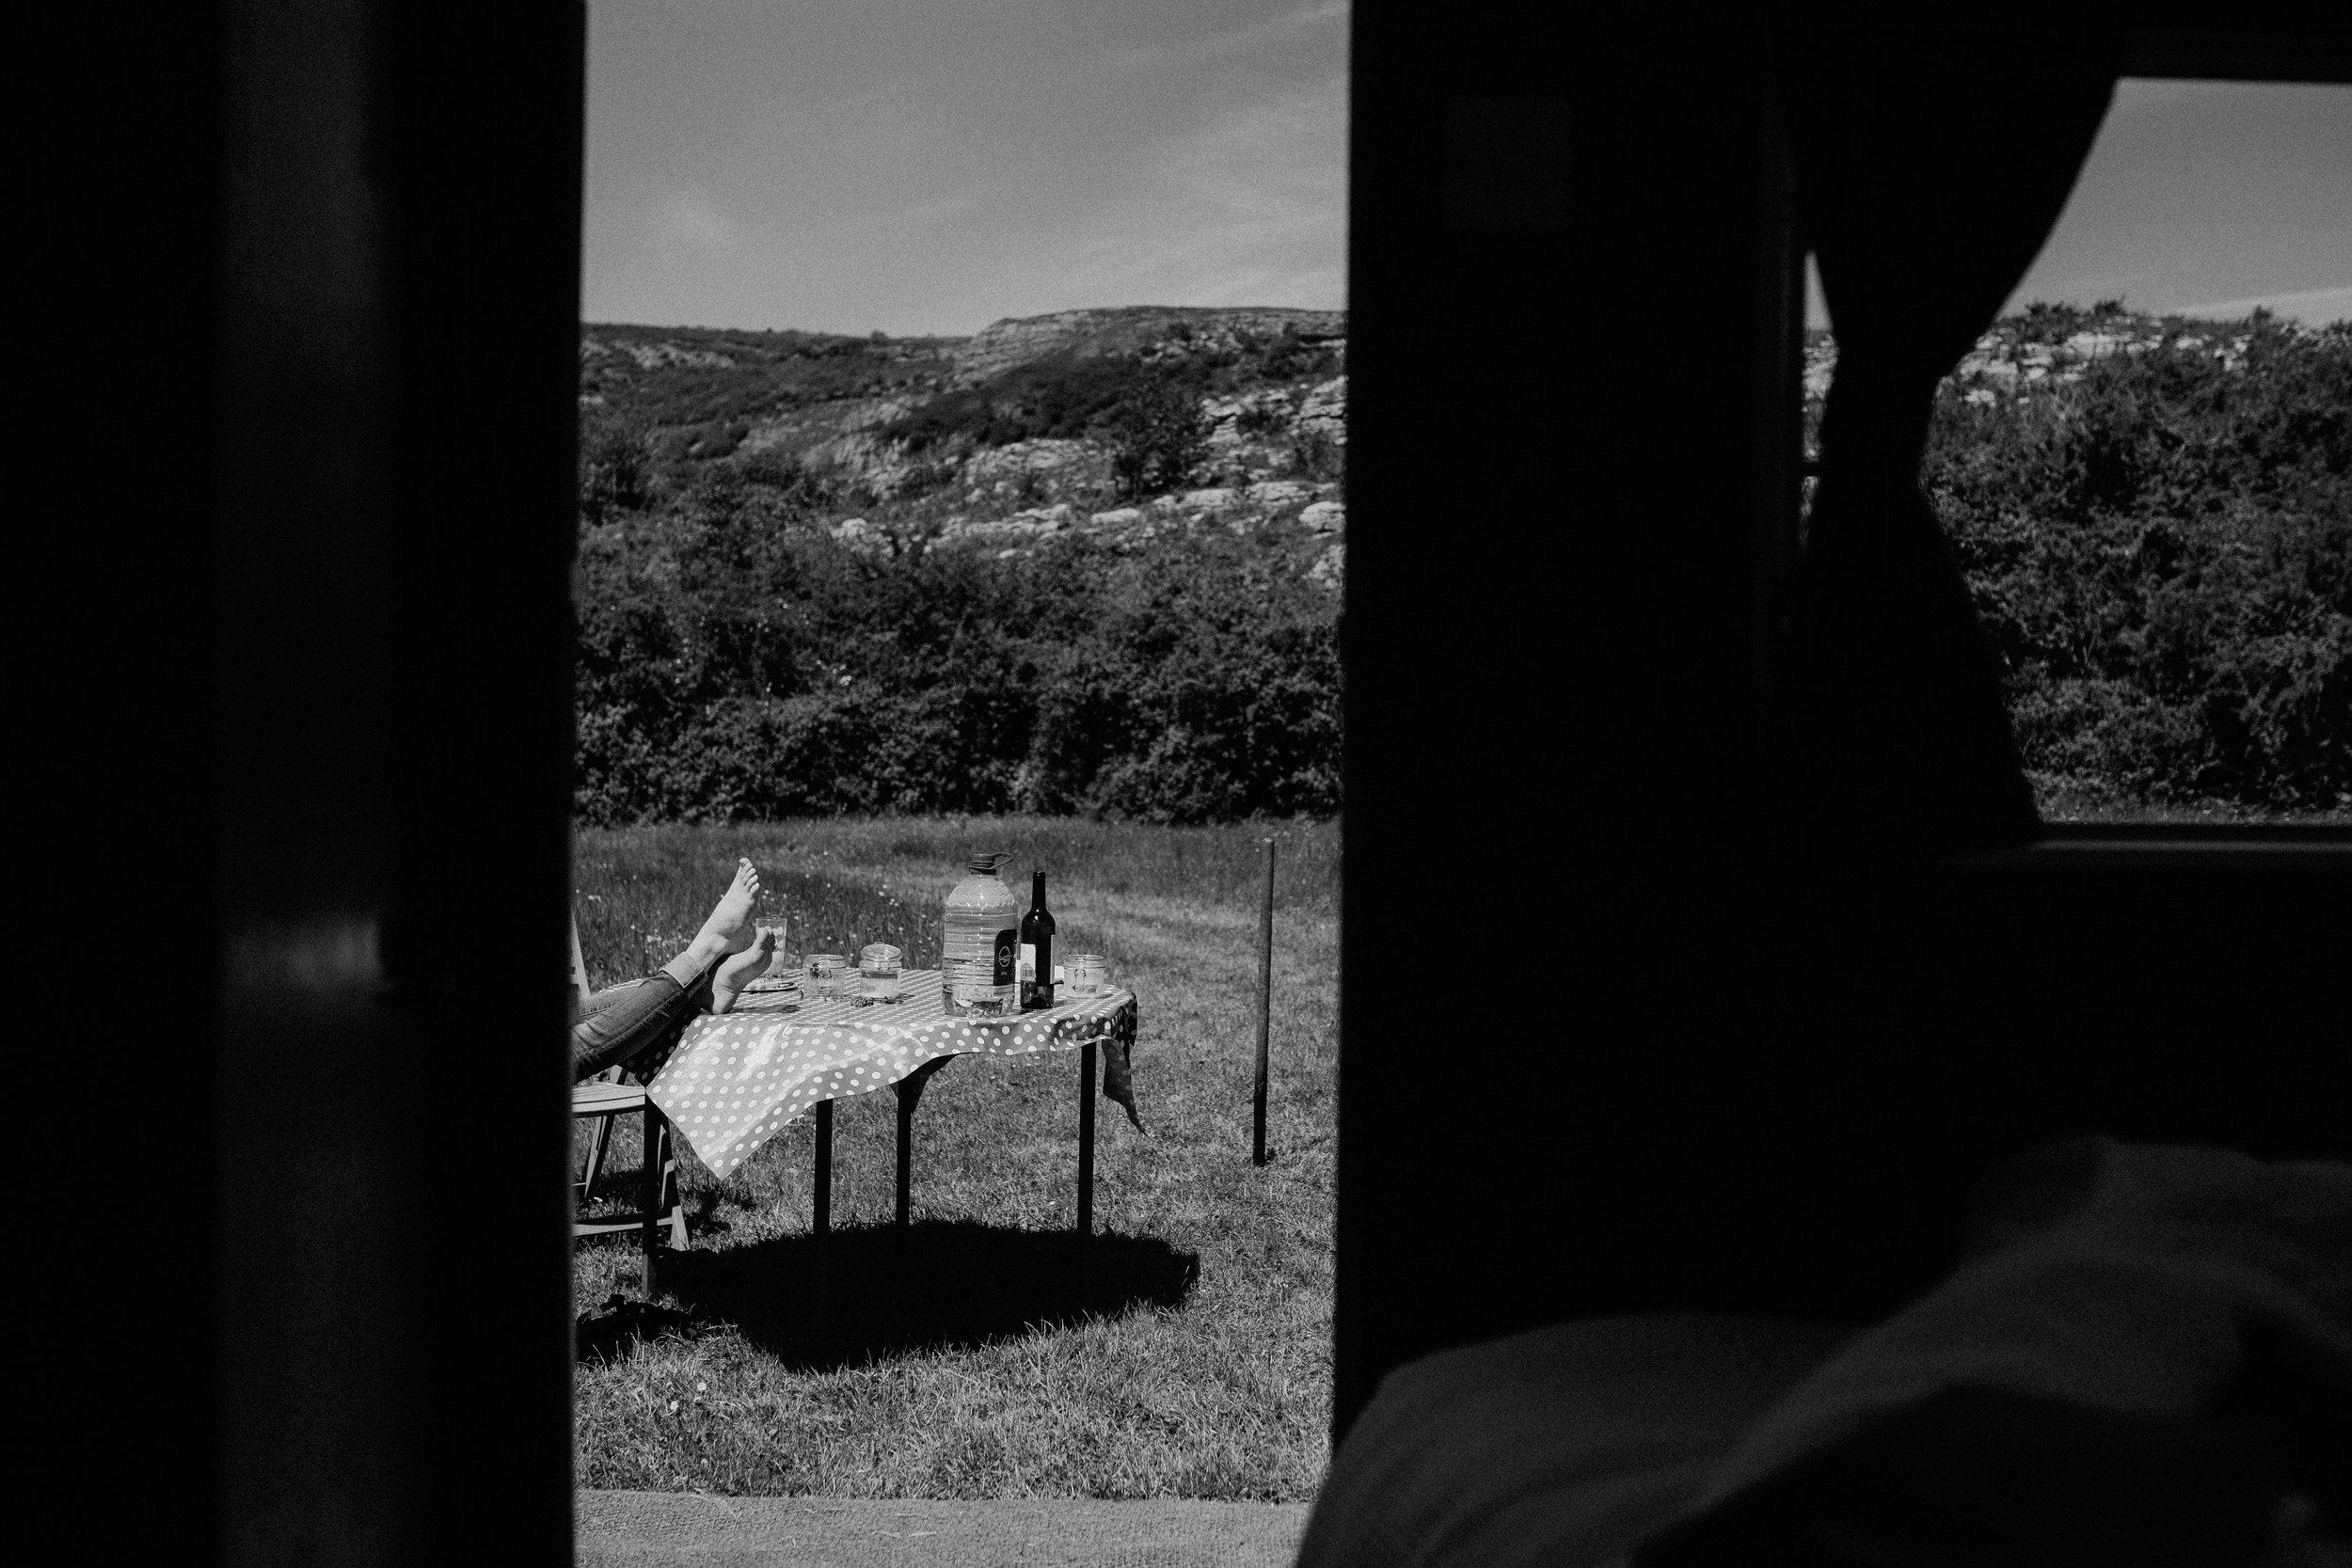 ireland-camper-8744.jpg